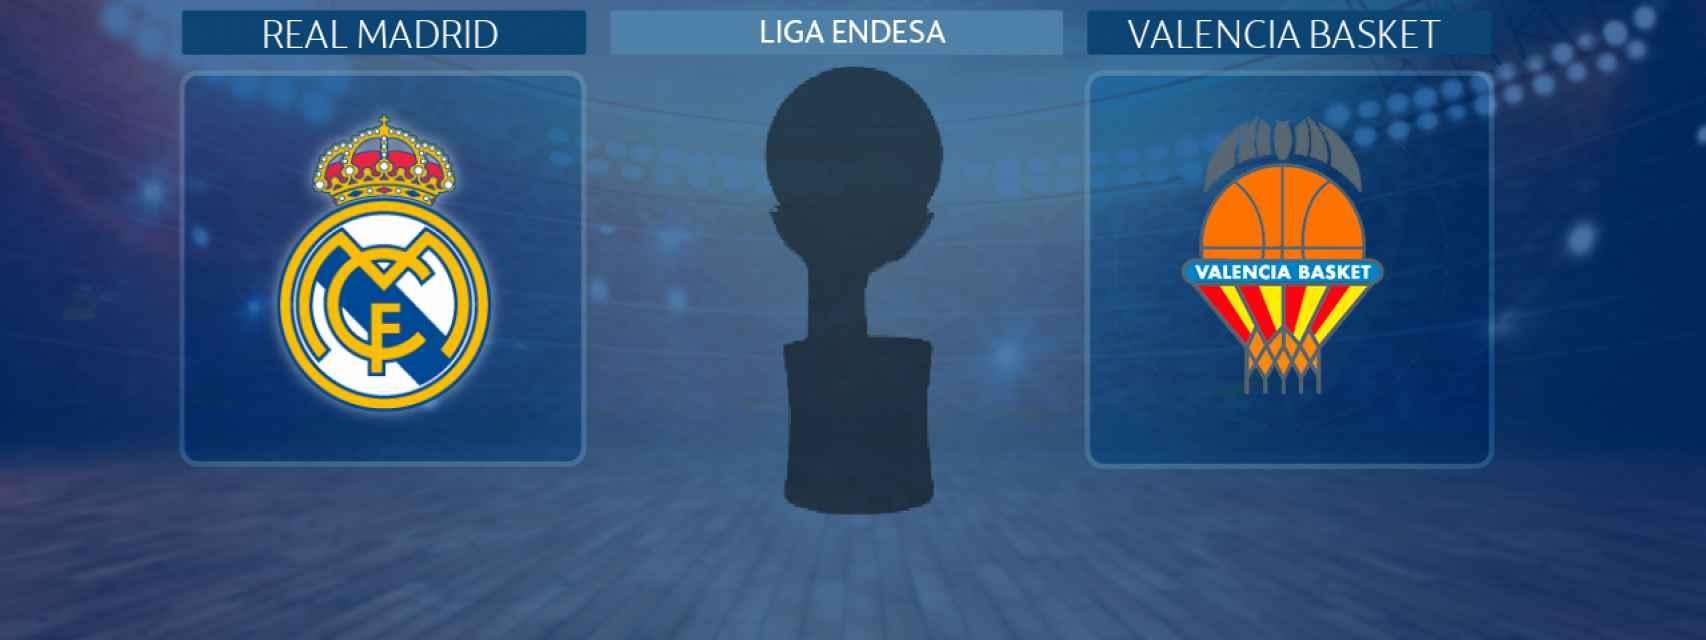 Real Madrid - Valencia Basket, semifinal de la Liga Endesa